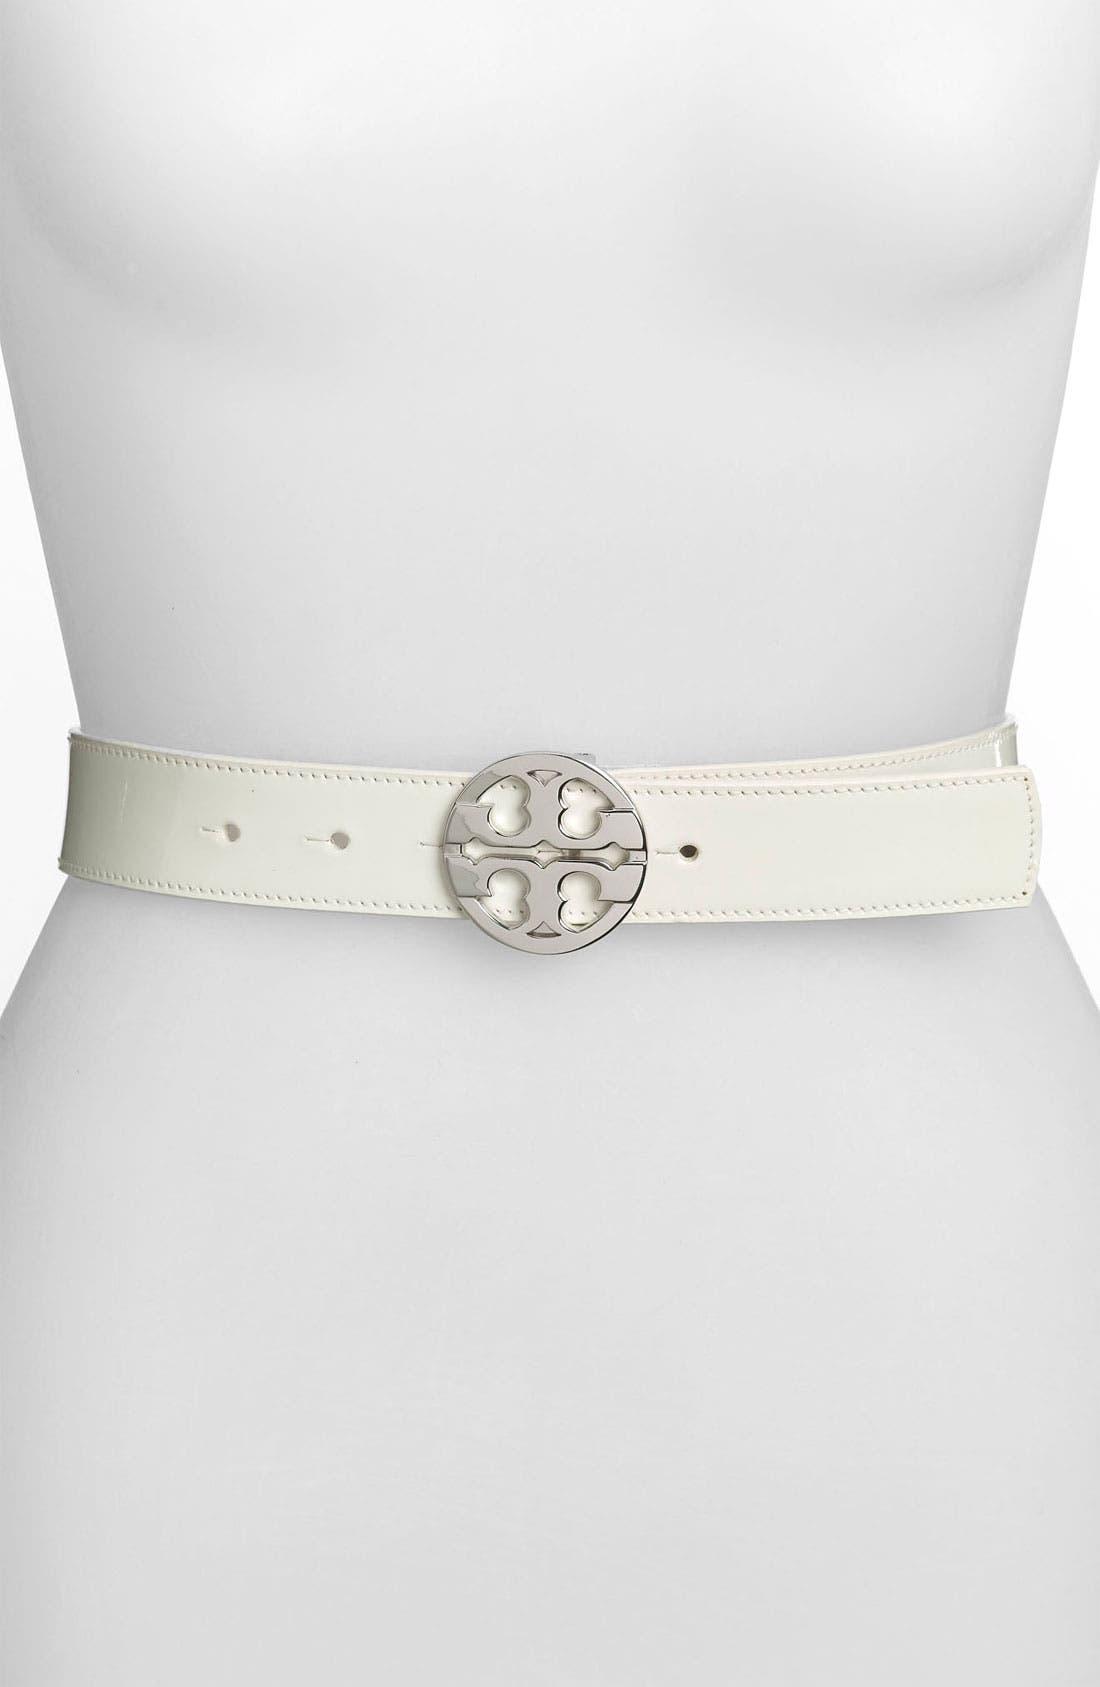 Main Image - Tory Burch Leather Belt